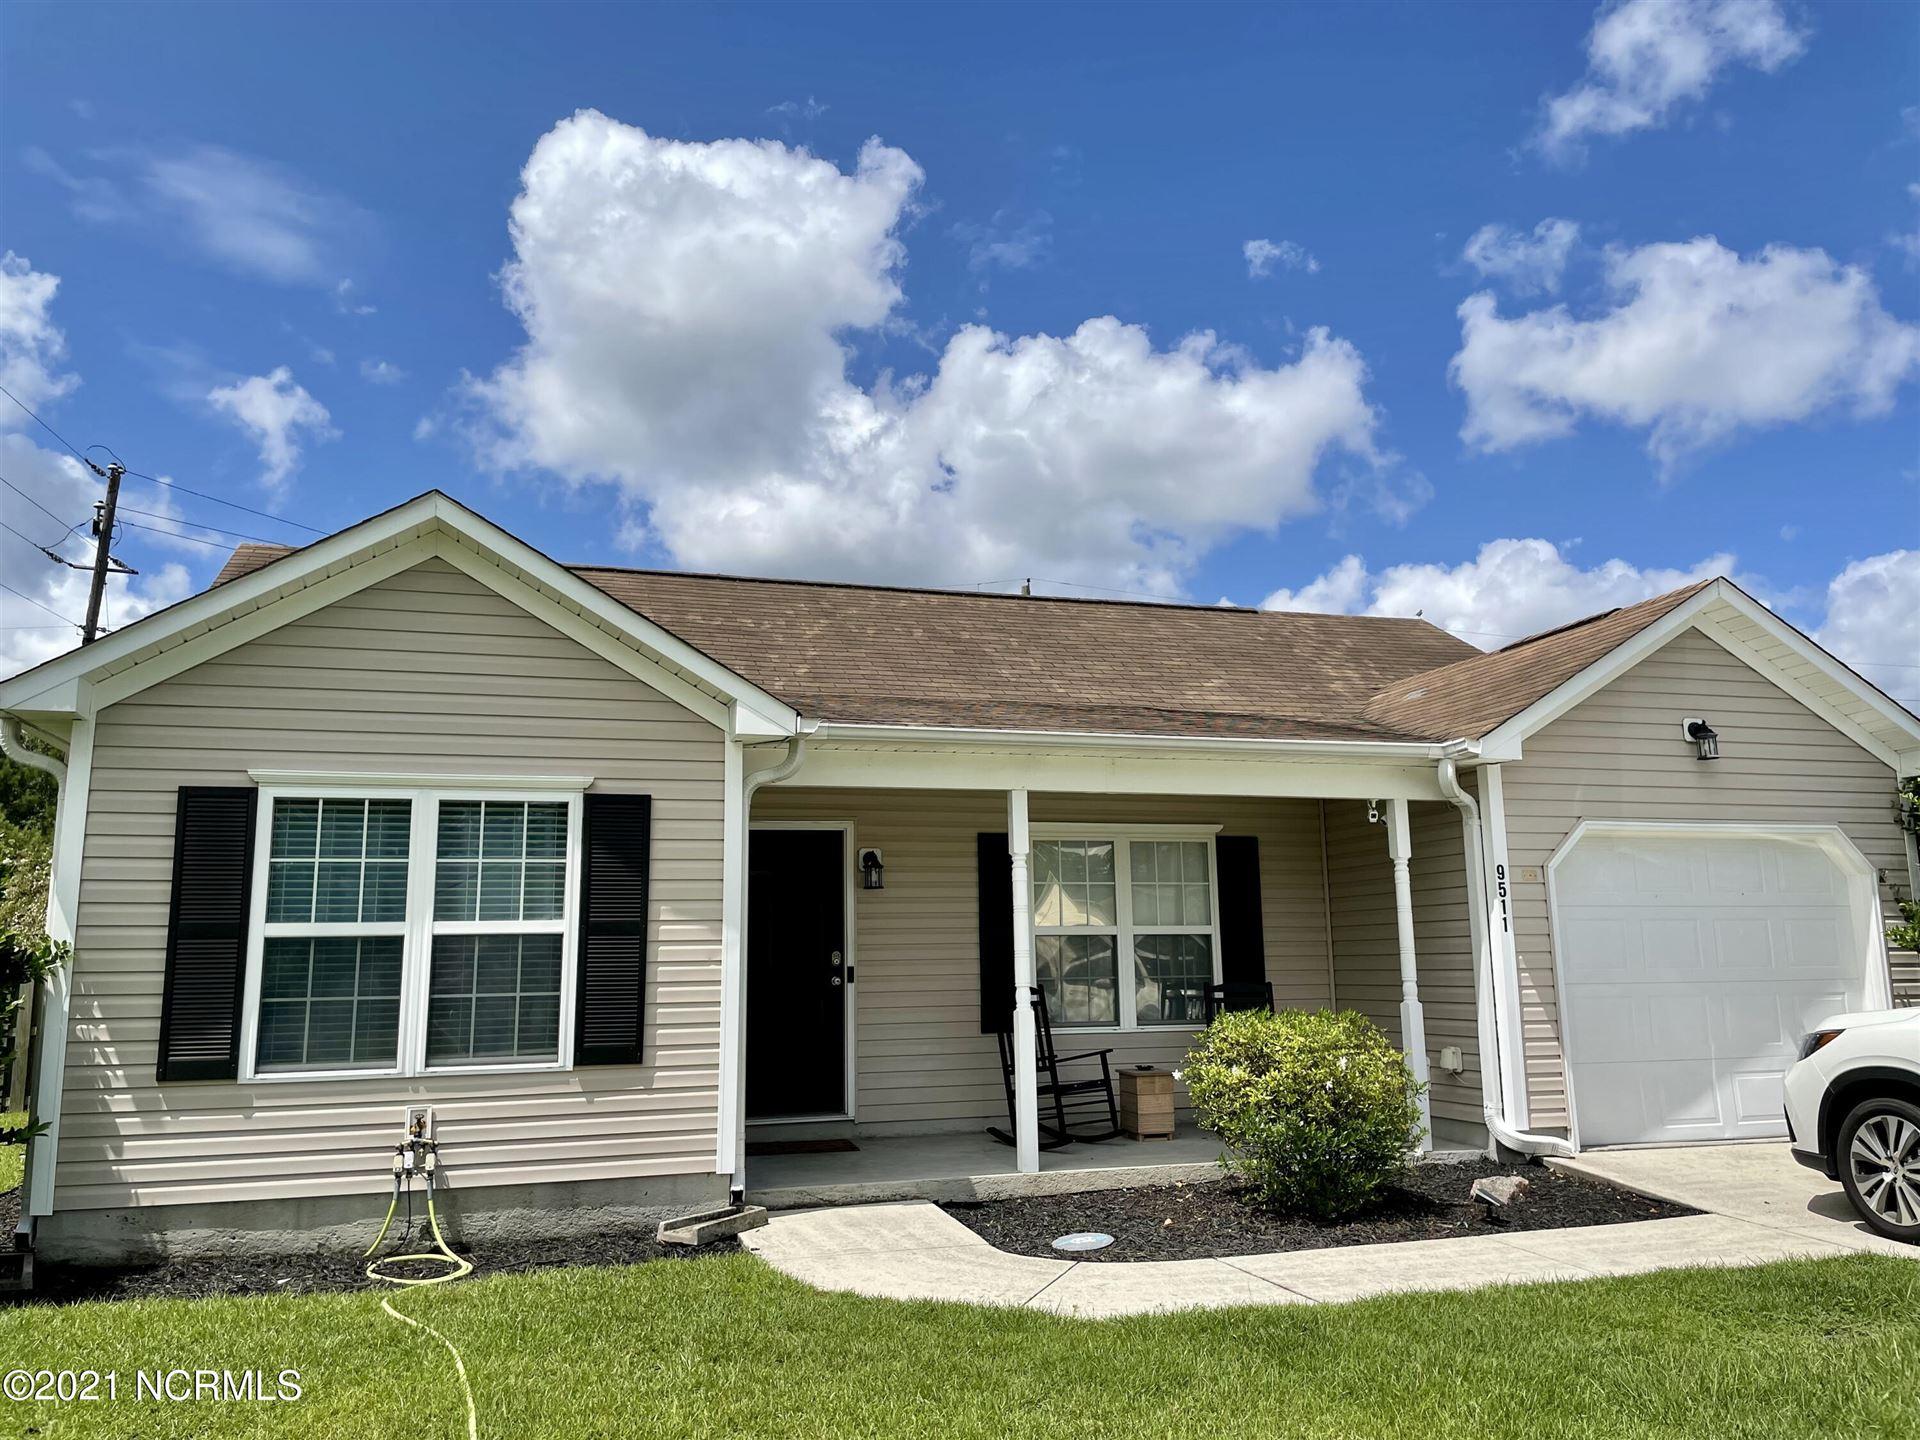 Photo for 9511 Huckabee Drive NE, Leland, NC 28451 (MLS # 100285009)